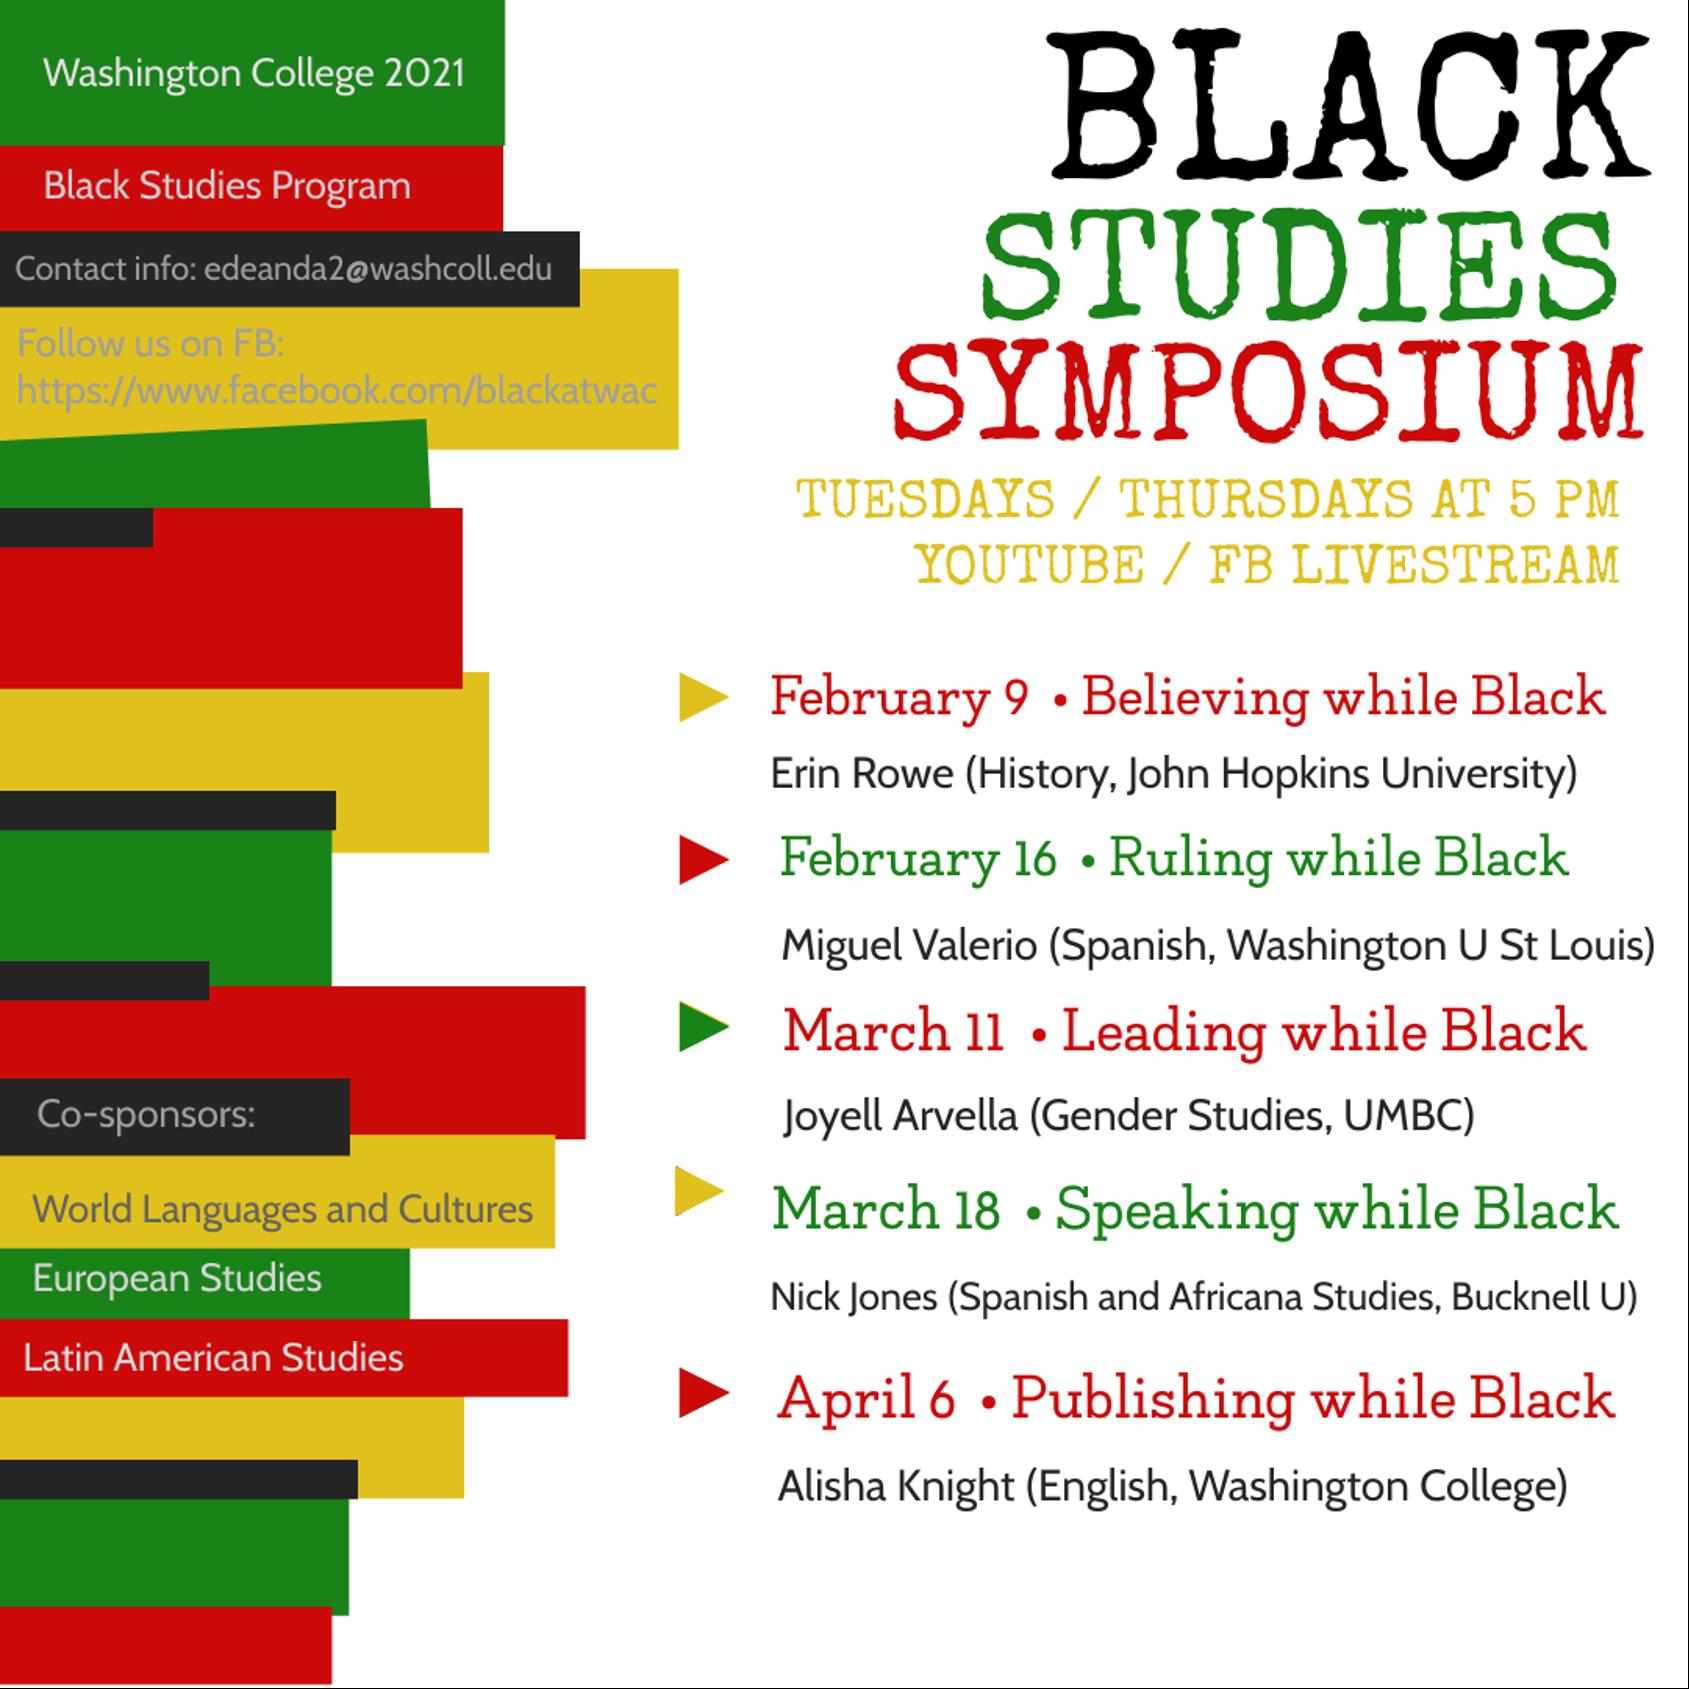 Black Studies Symposium - Leading while Black